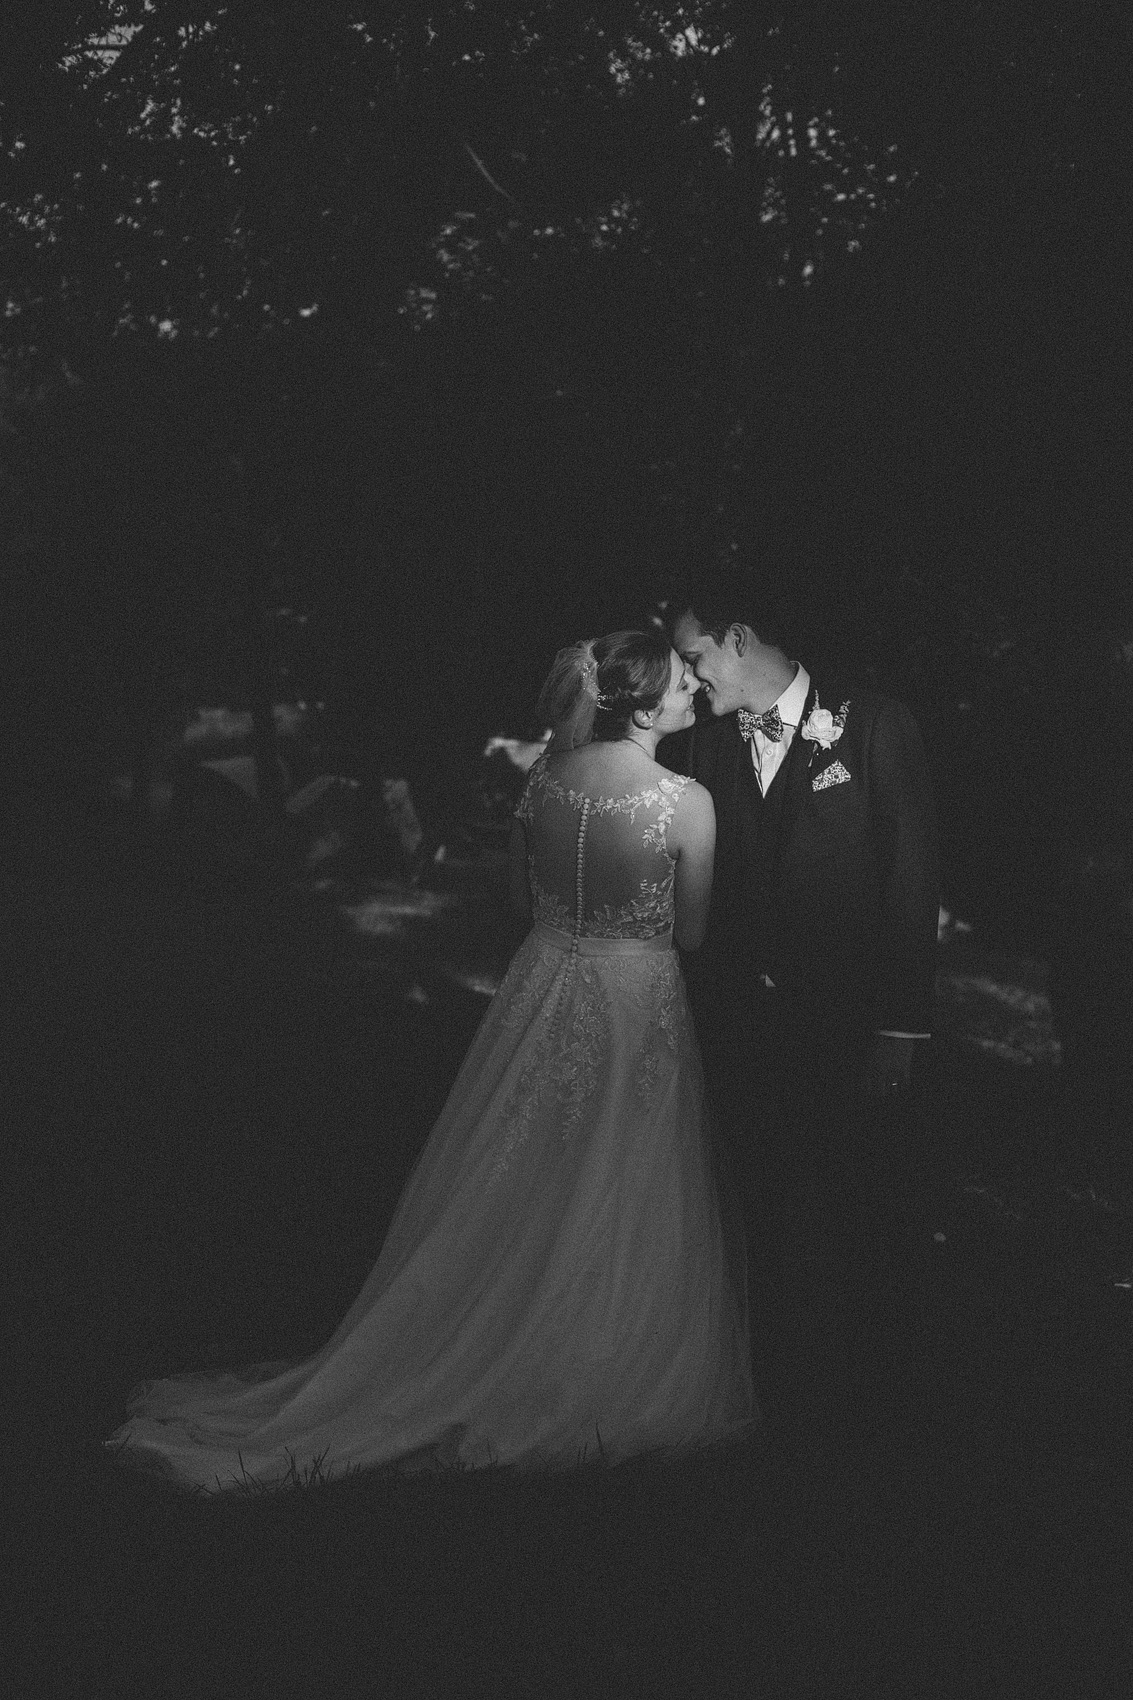 Dilhorne_Village_Hall_Wedding_Photography_-_81_.jpg